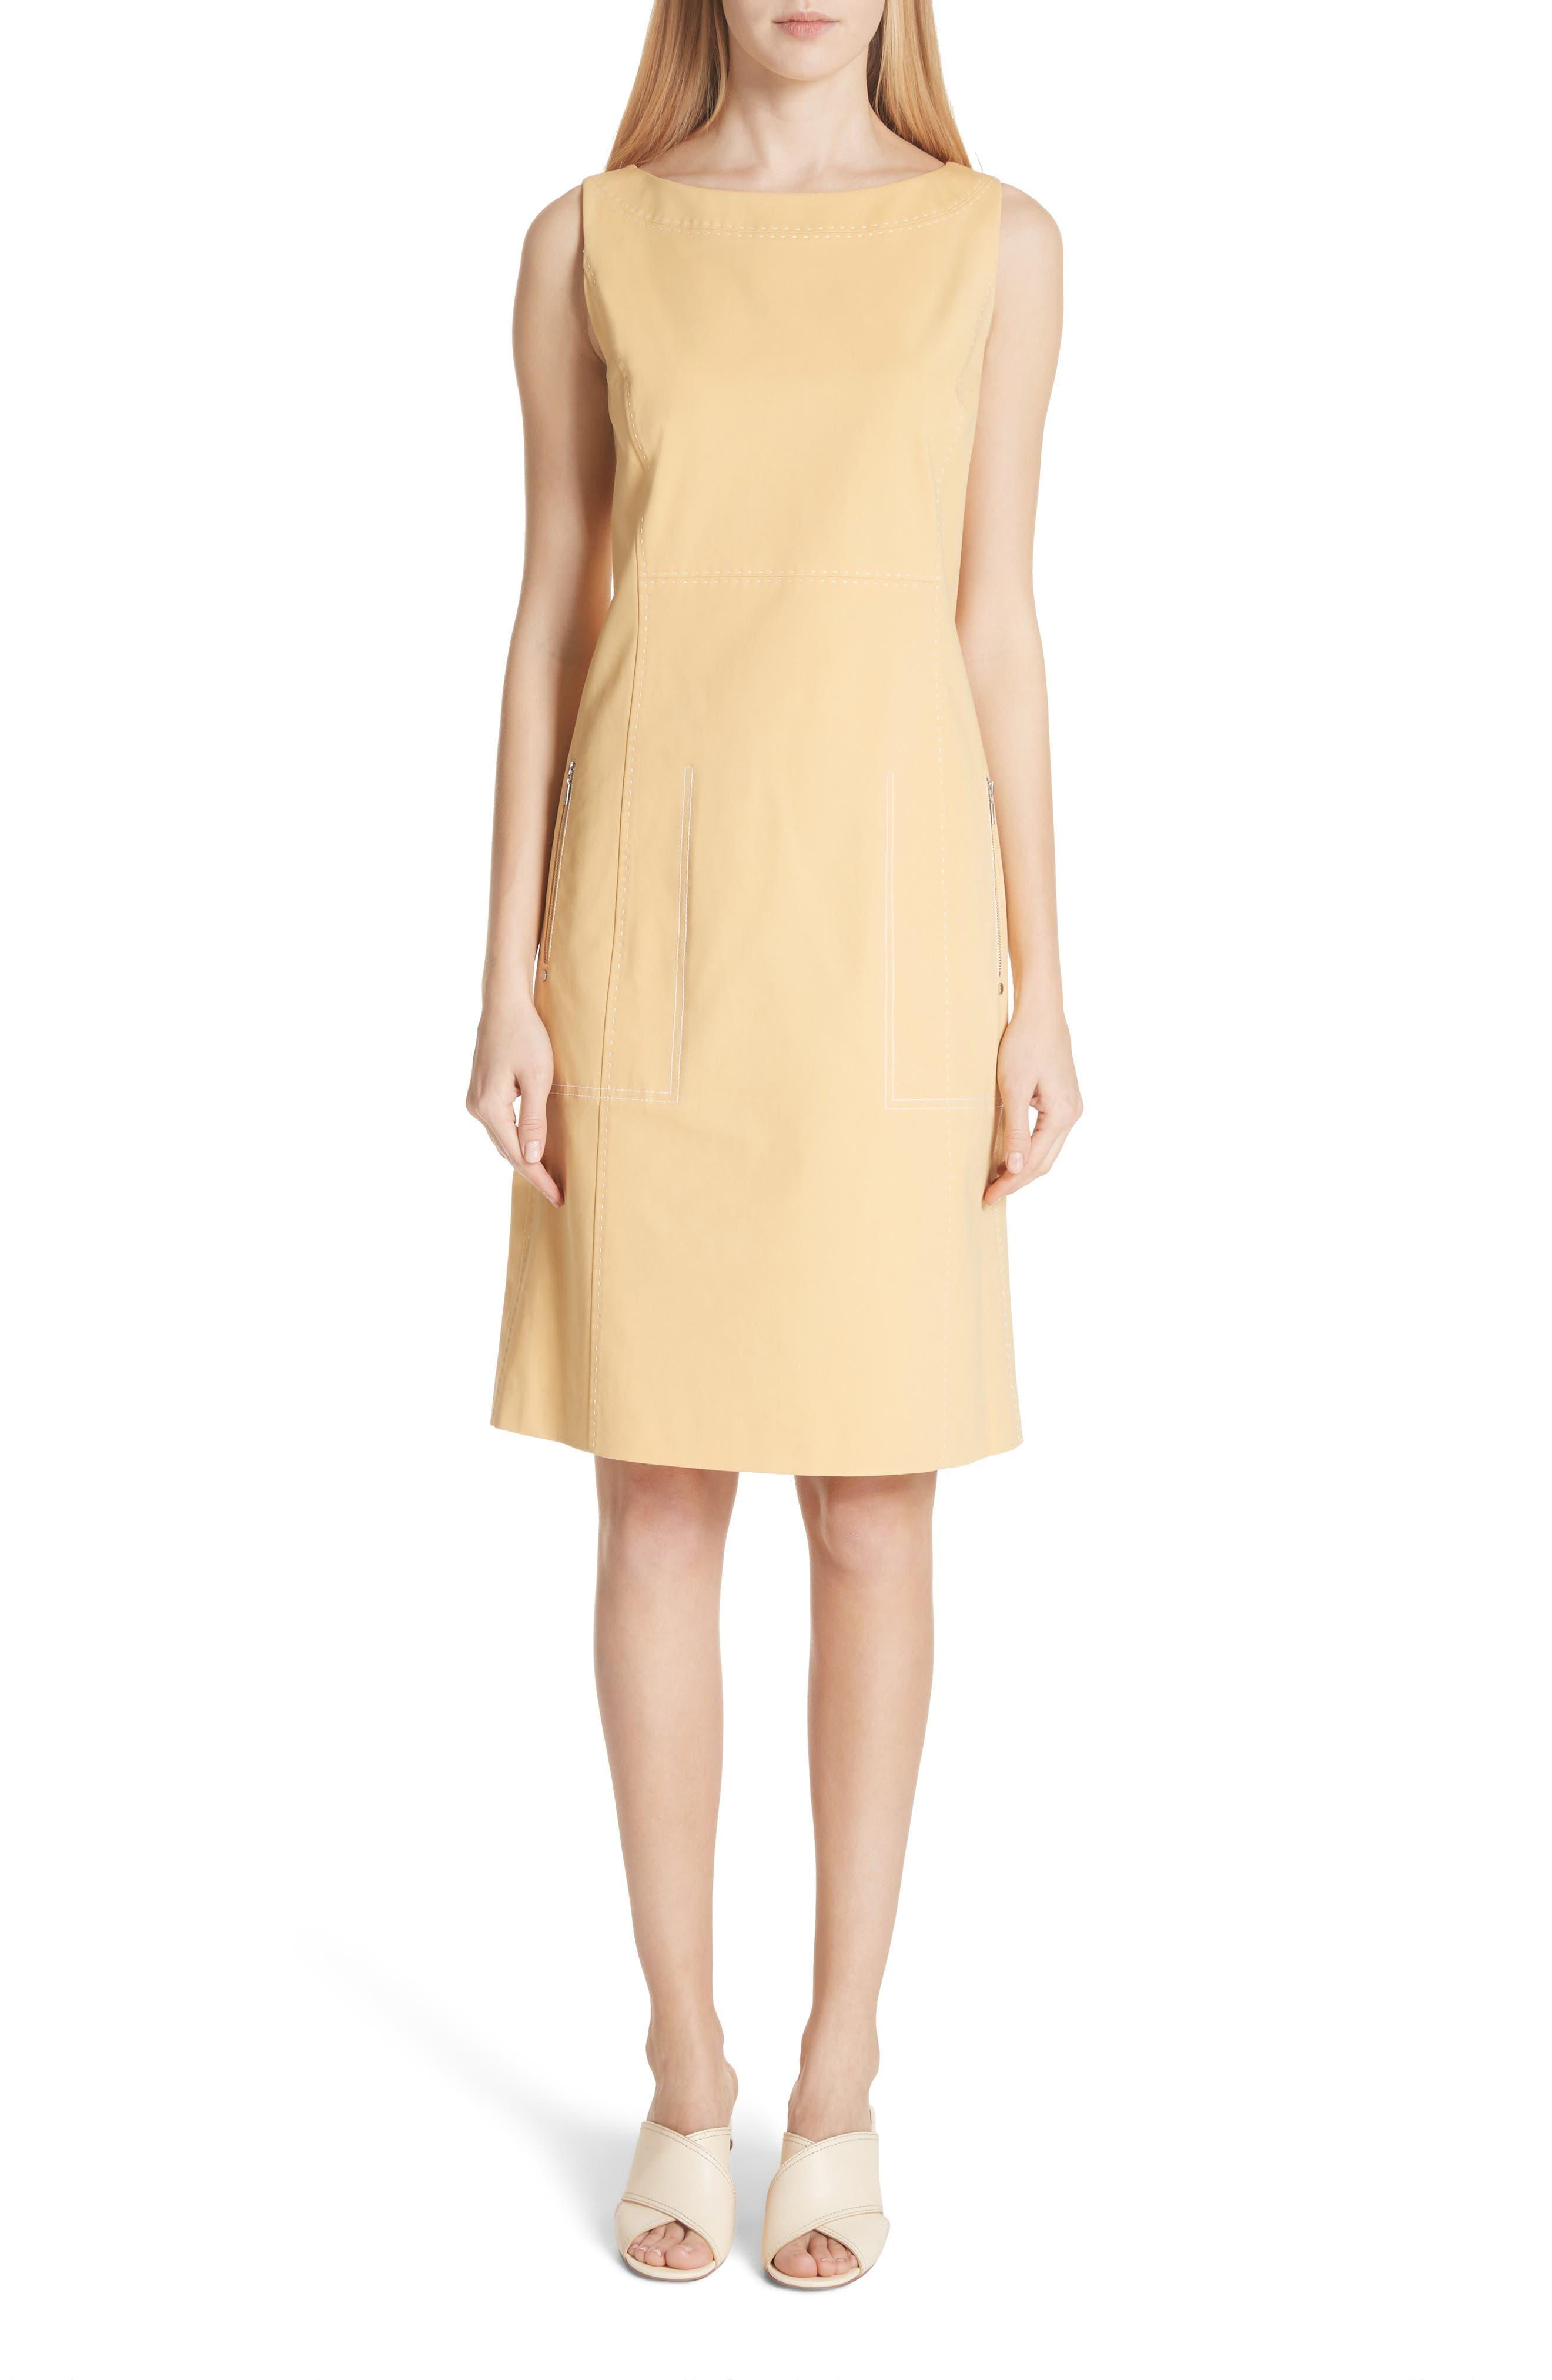 Paxton Sleeveless Sheath Dress,                         Main,                         color, Sienna Yellow